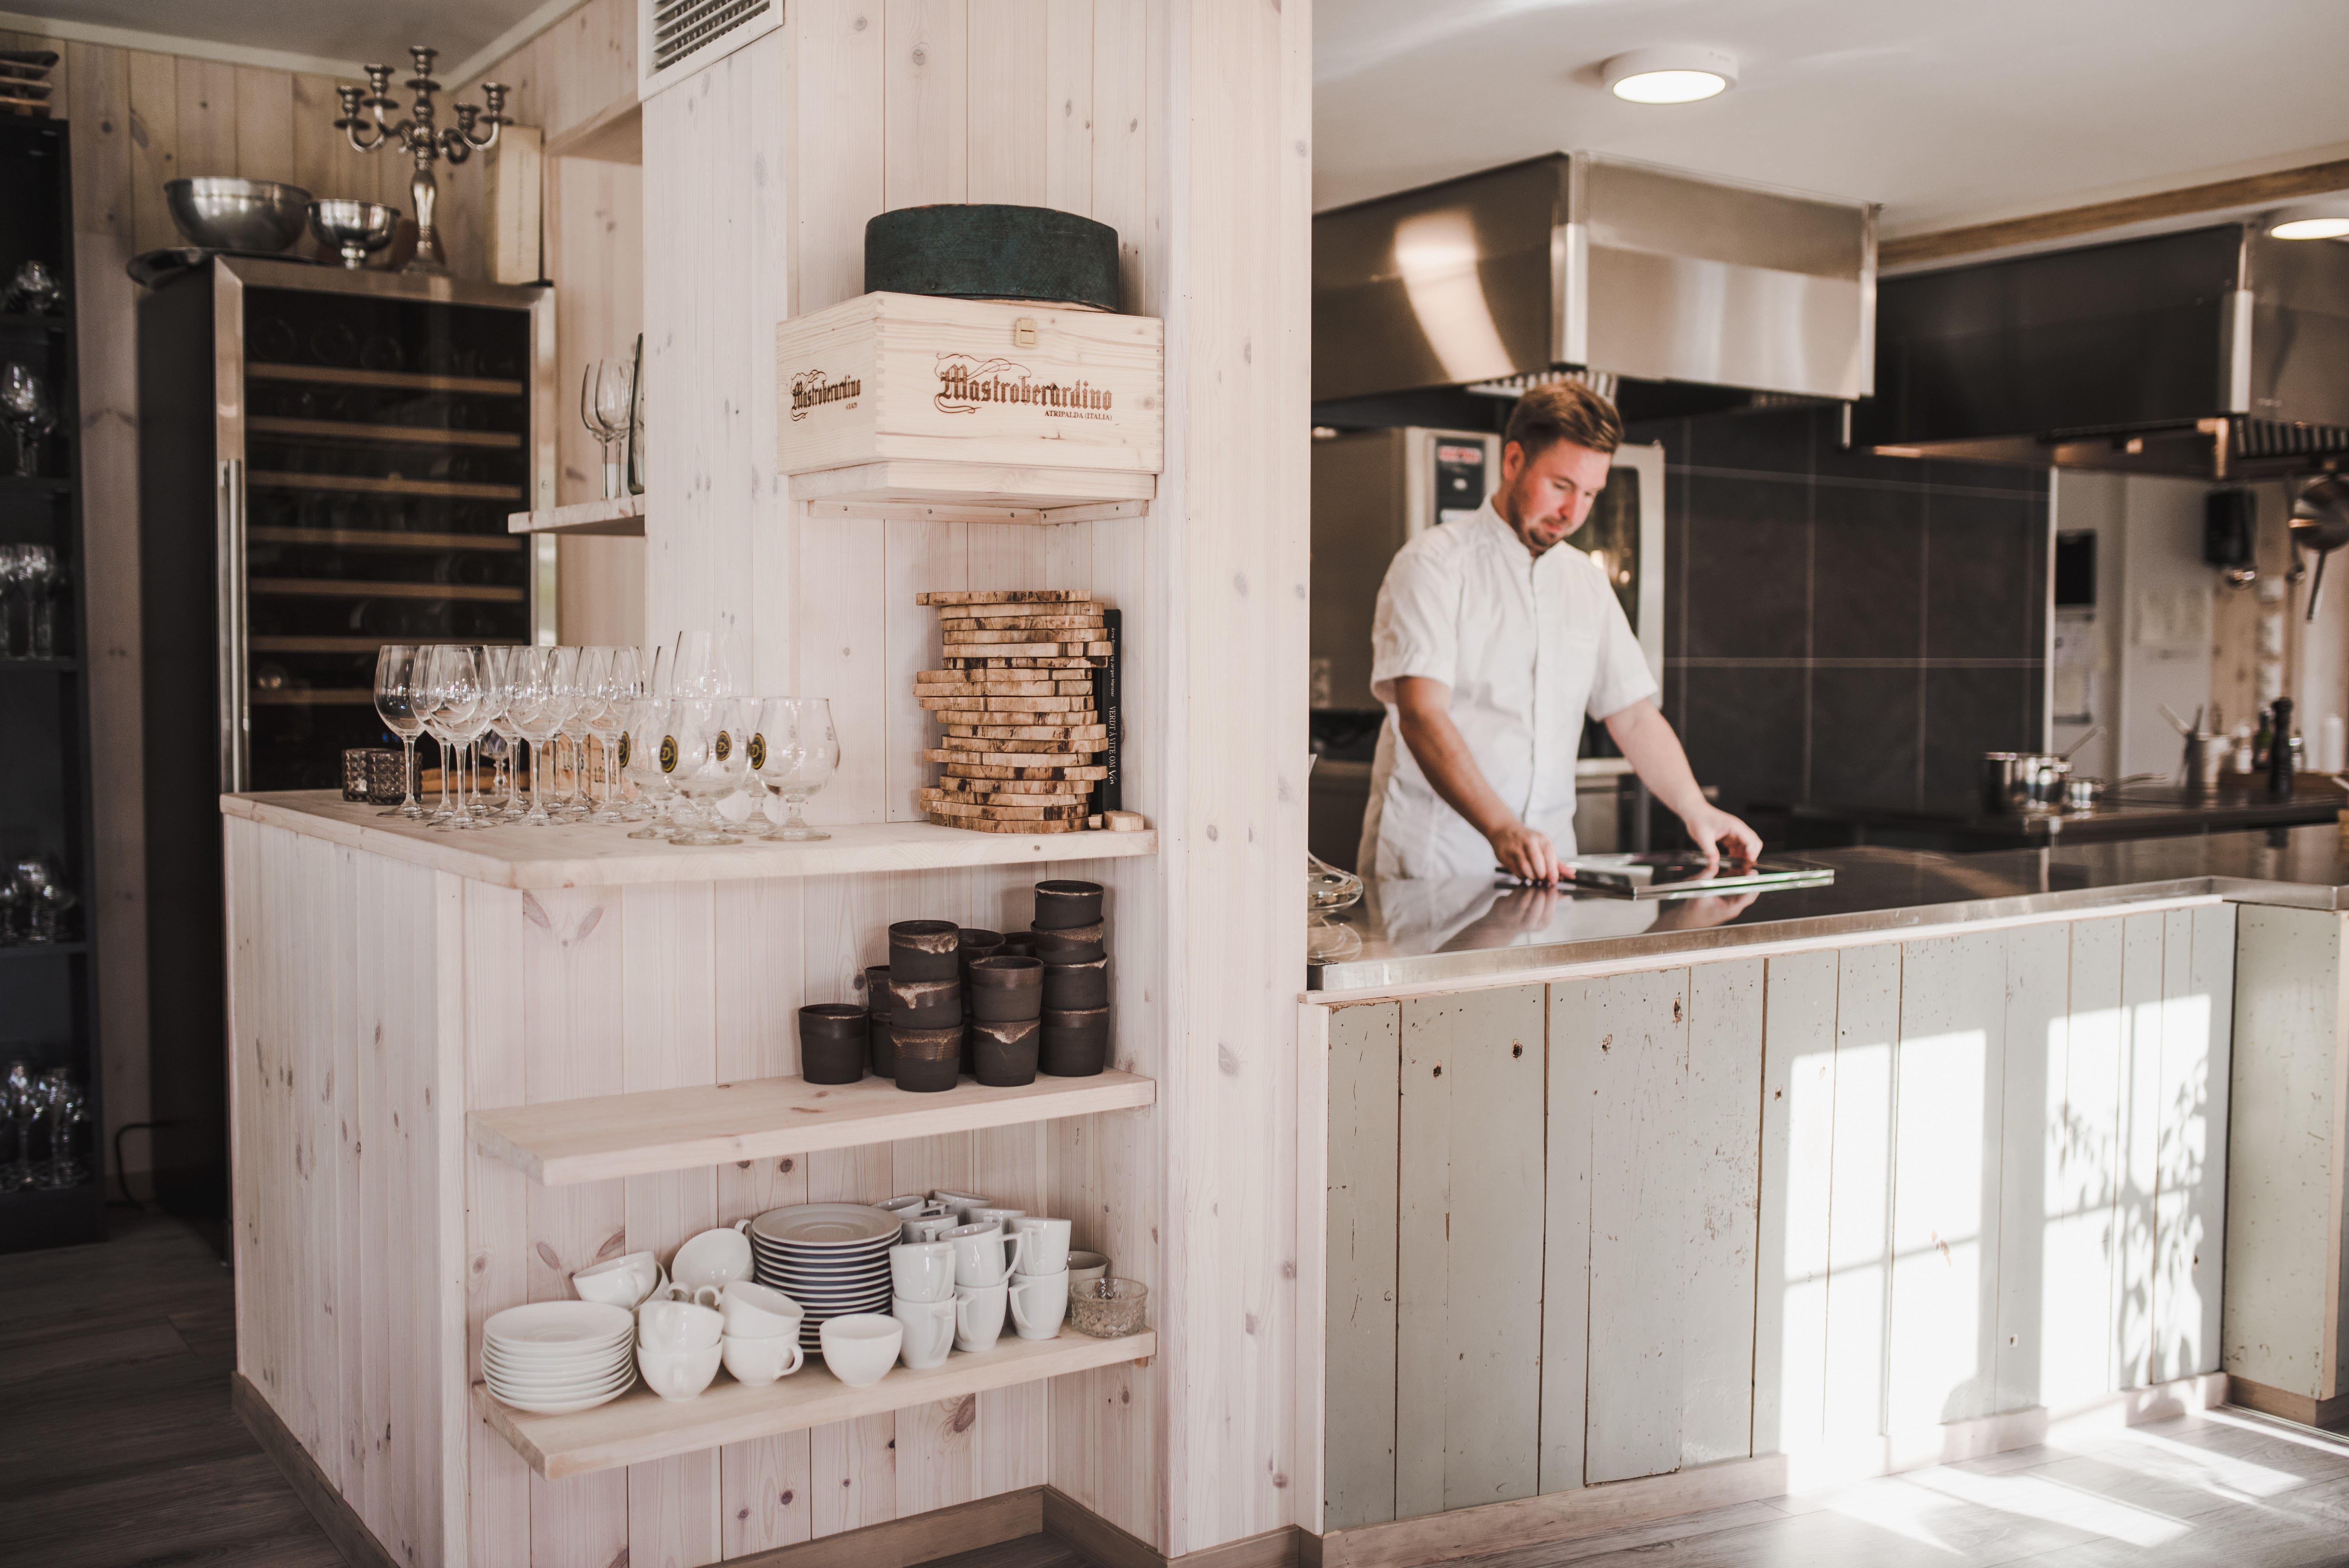 Fotoriet,  © TileElise, Restaurant Til Elise fra Marius